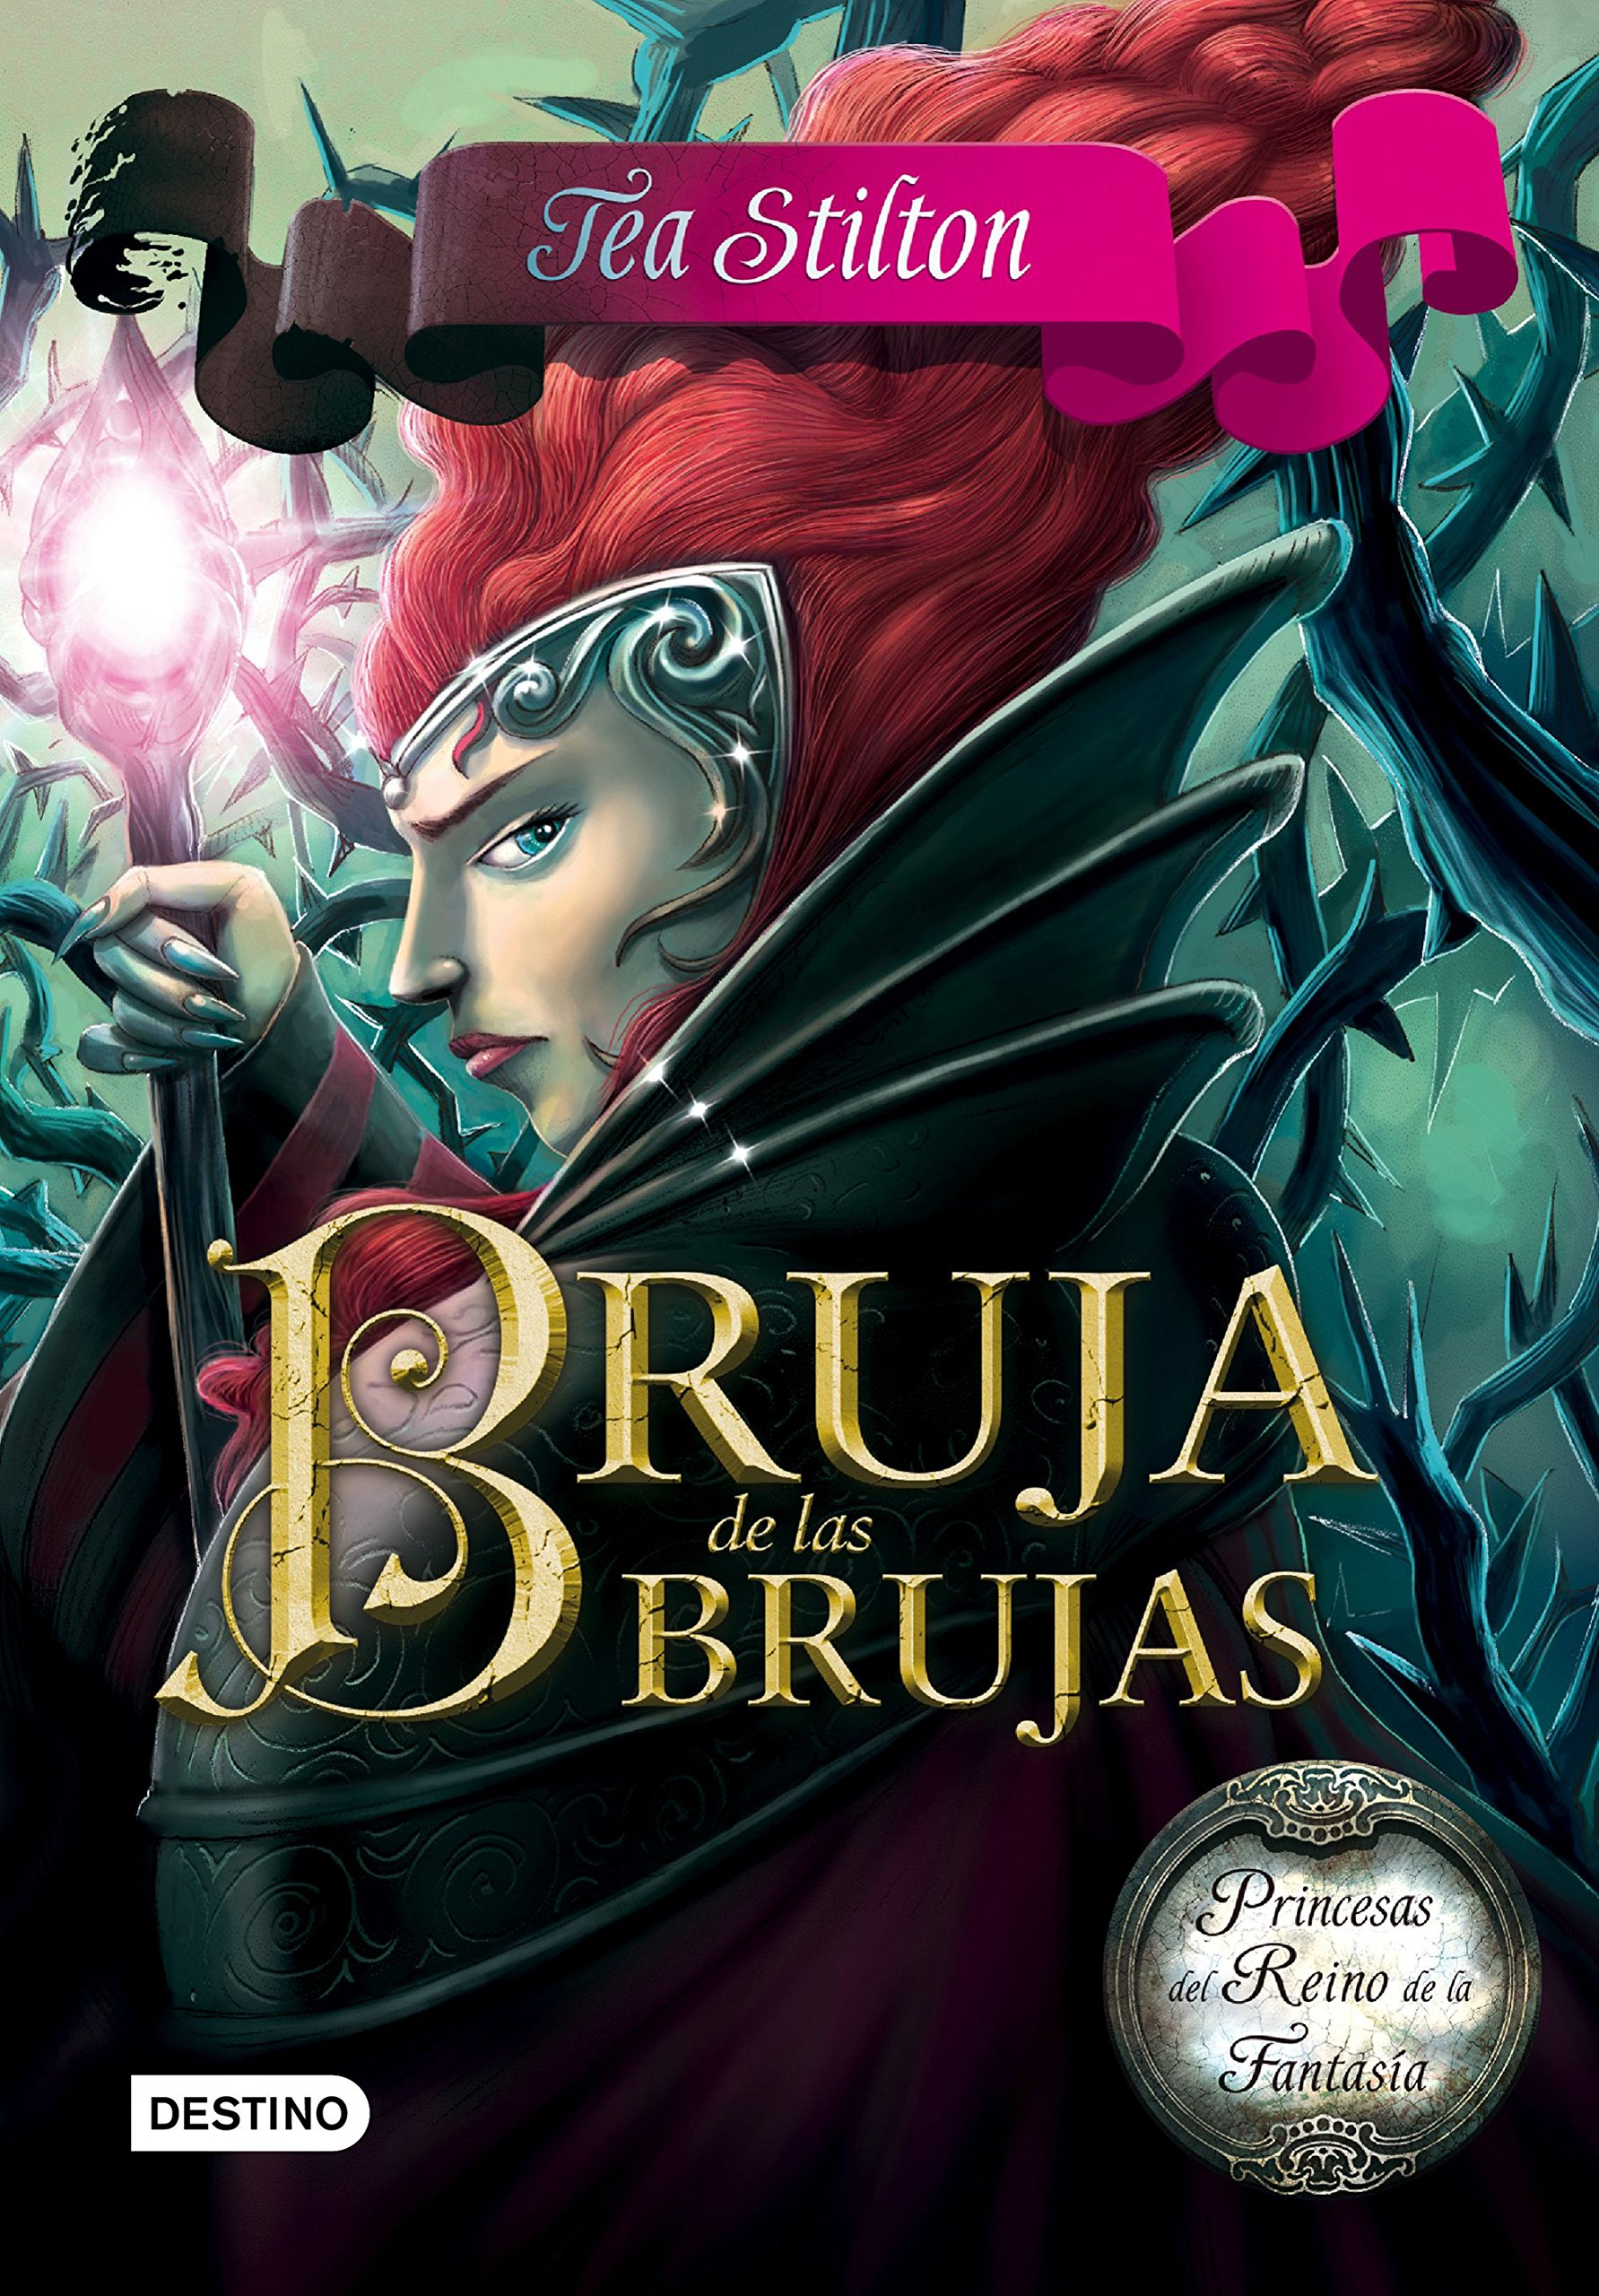 Bruja de las brujas: Princesas del Reino de la Fantasía Tea Stilton: Amazon.es: Tea Stilton, Helena Aguilà: Libros